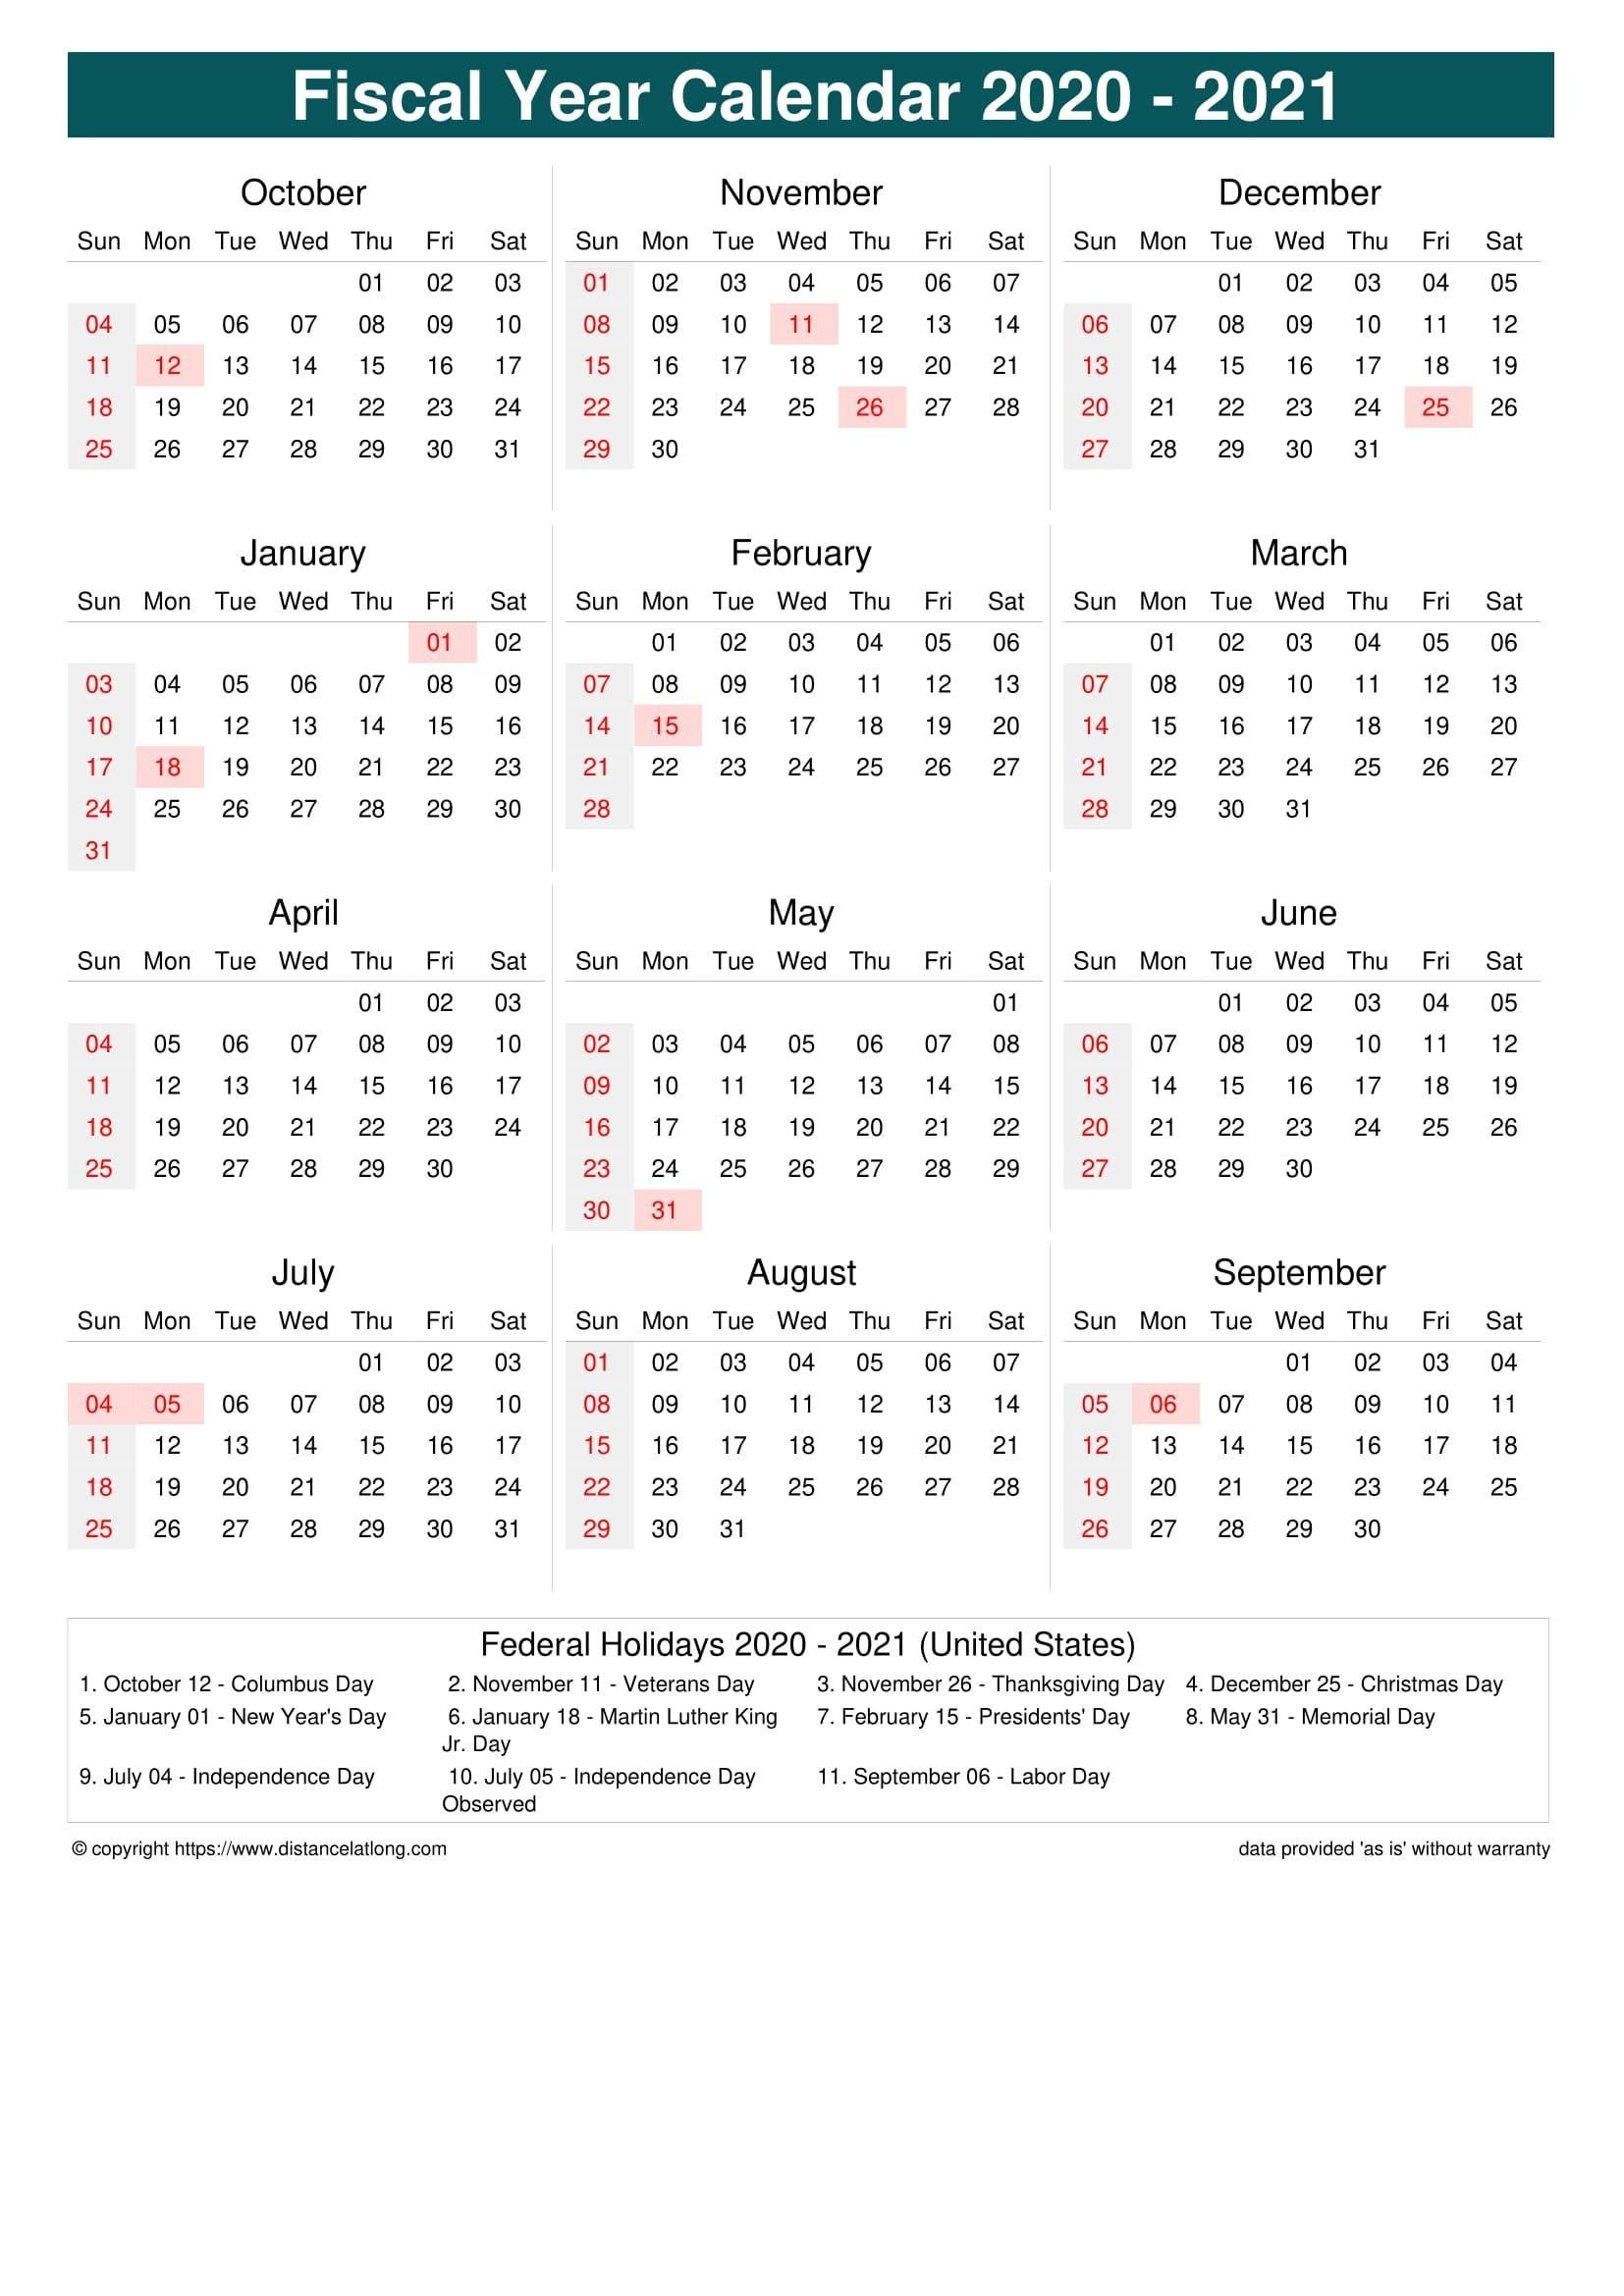 Fiscal Year Australia 2021 - Template Calendar Design